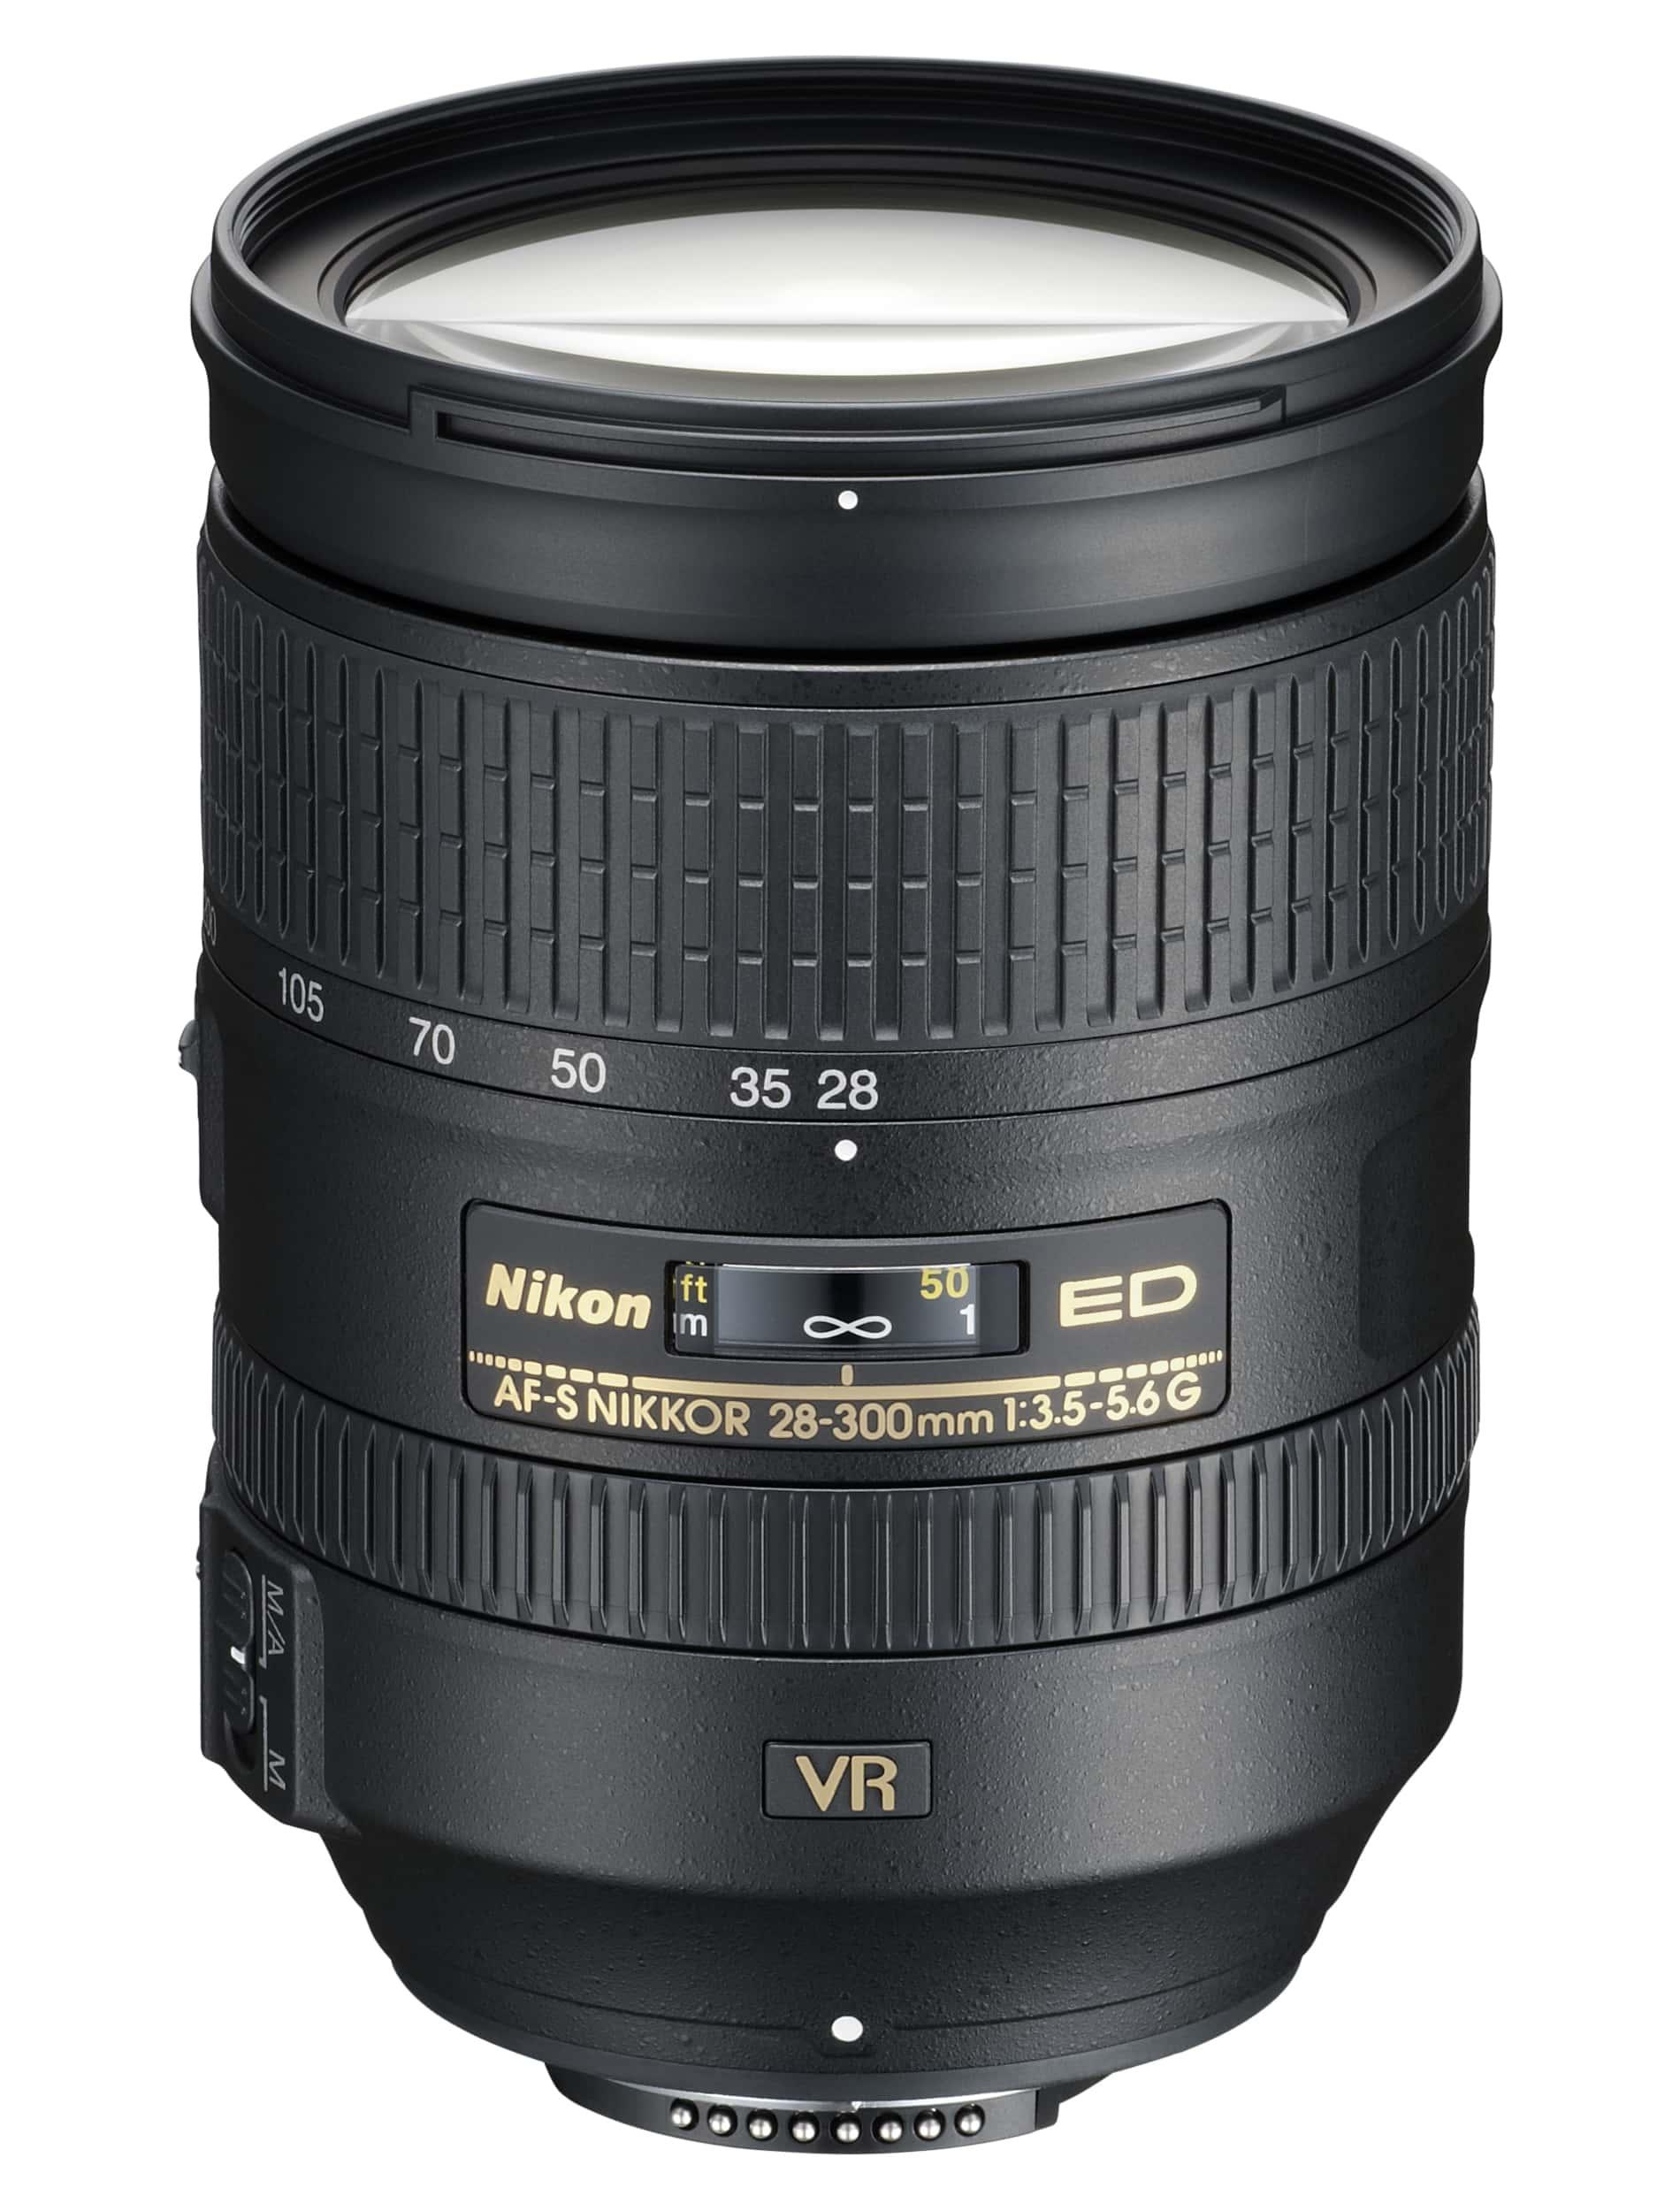 The Best Canon Sony And Nikon Lenses For Full Frame Cameras